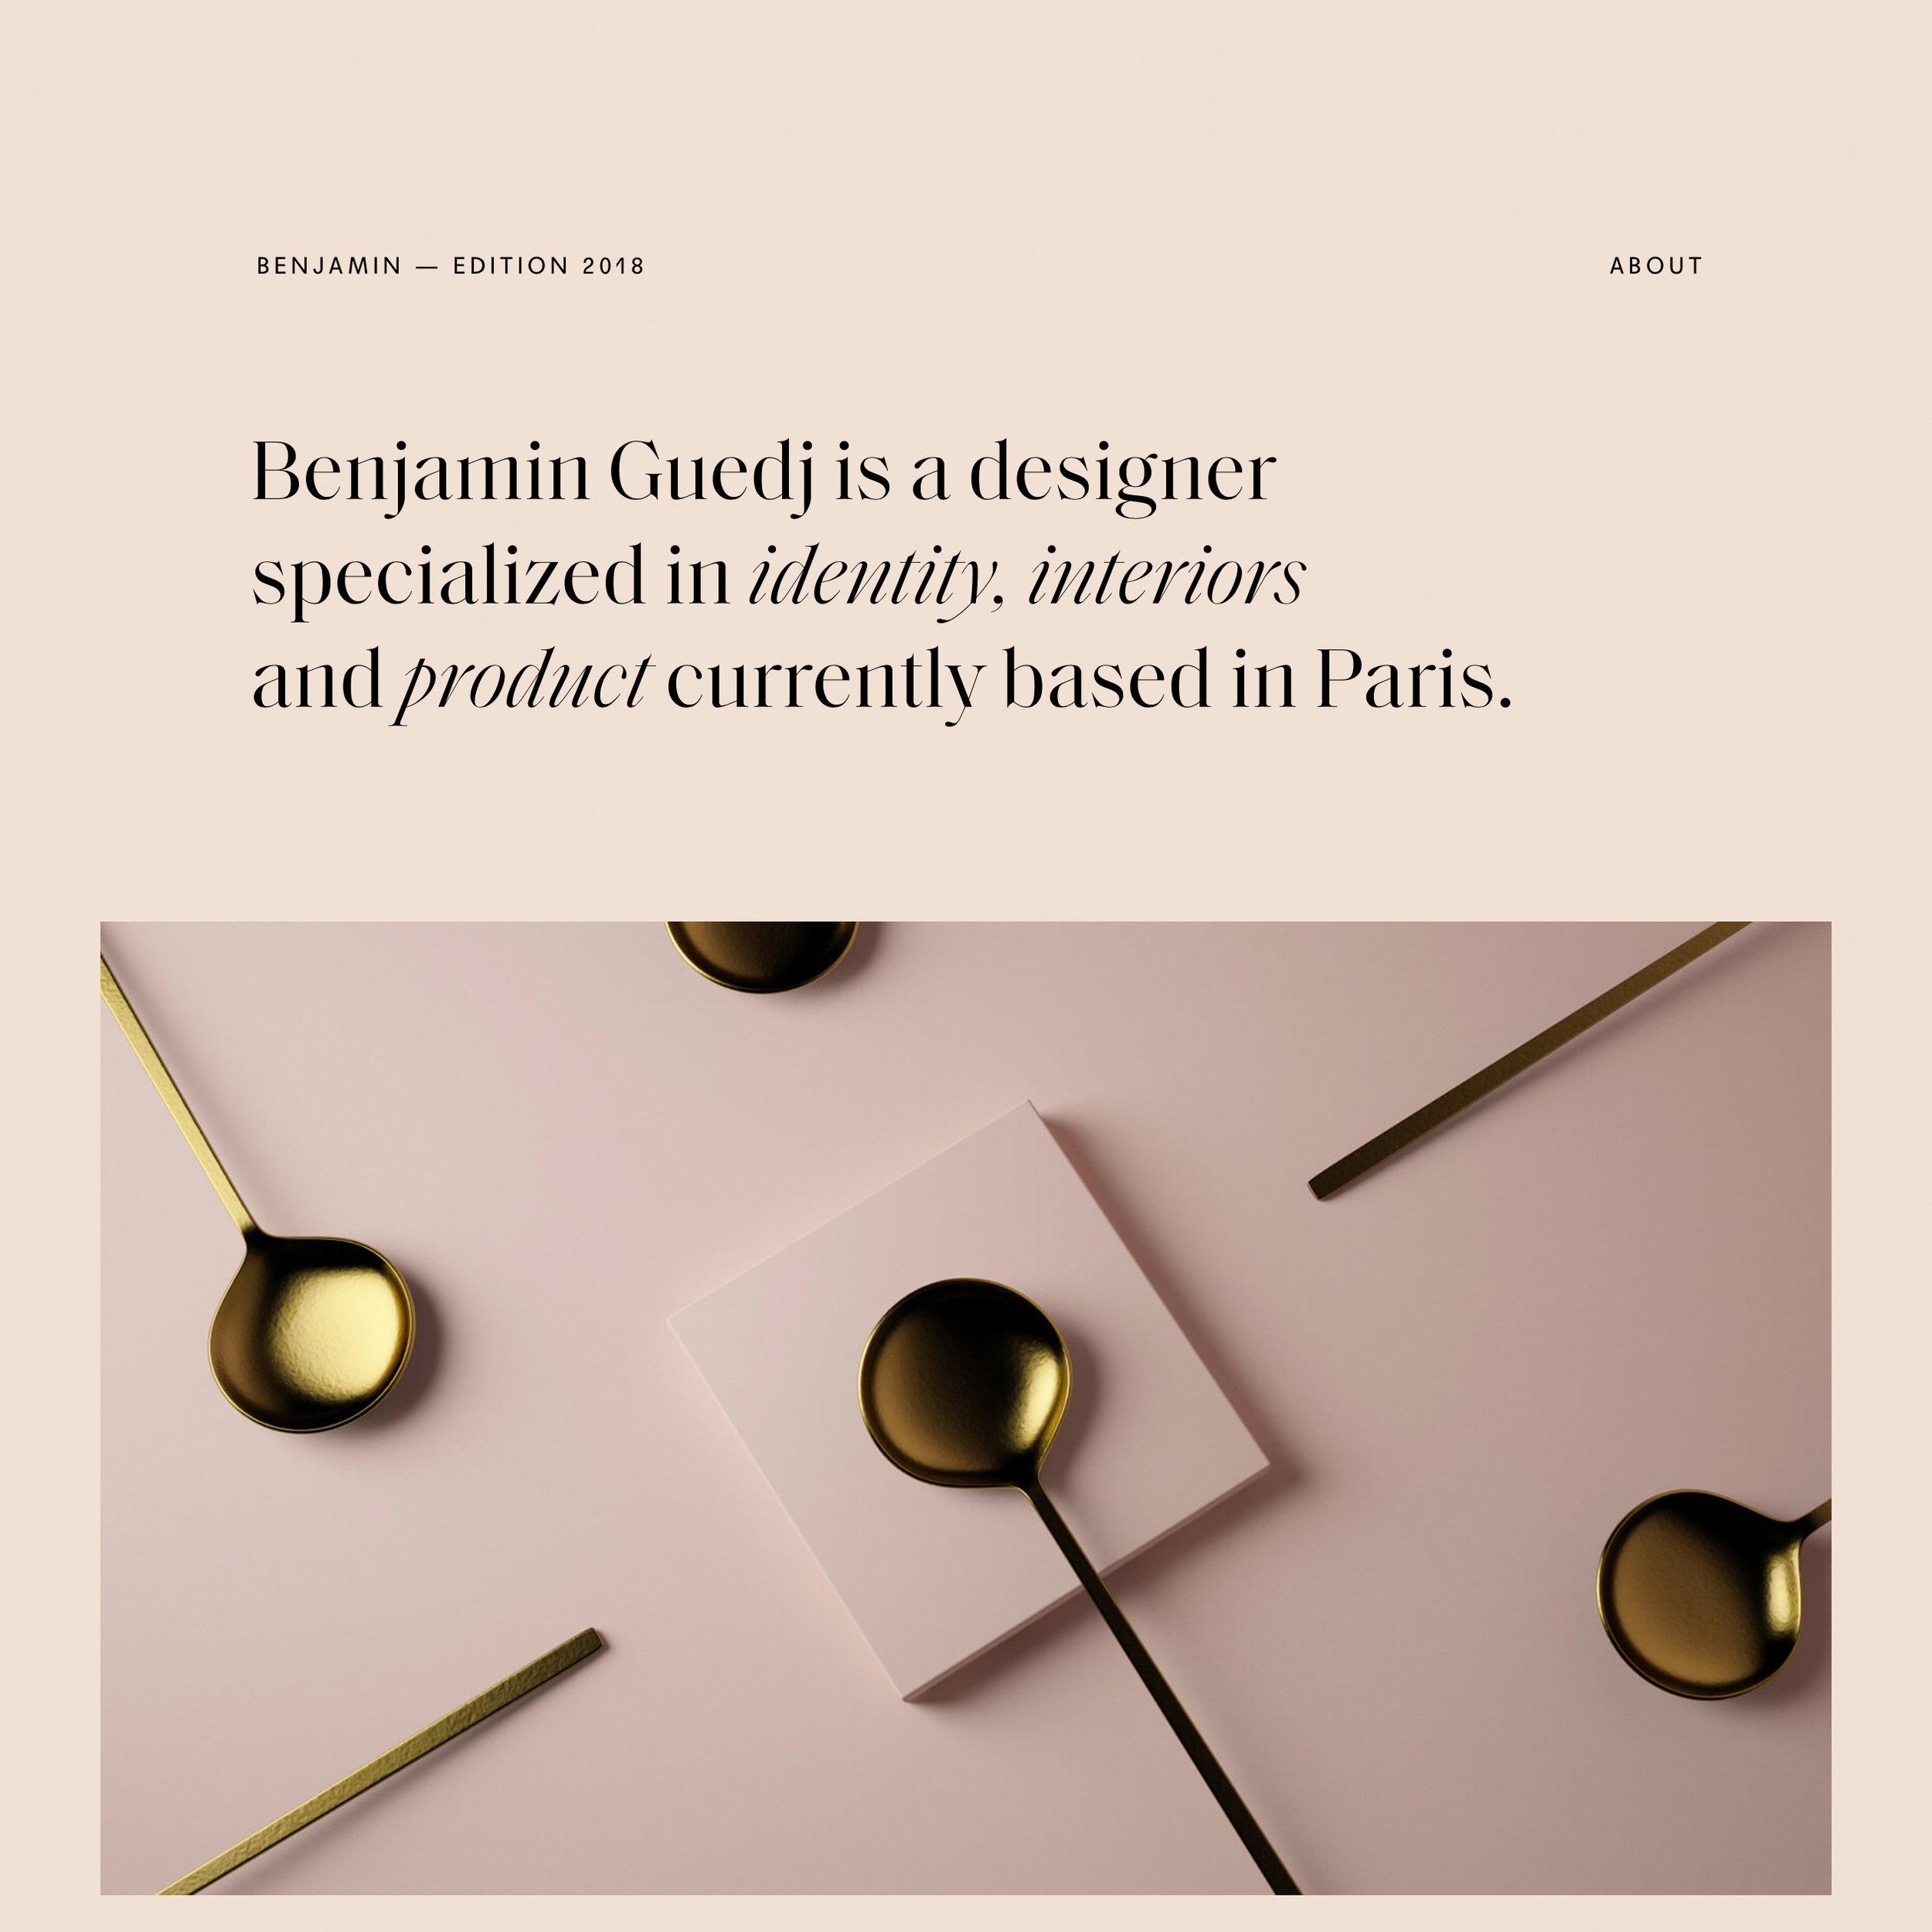 Benjamin Guedj    Fonts:       Saol Display, Agipo